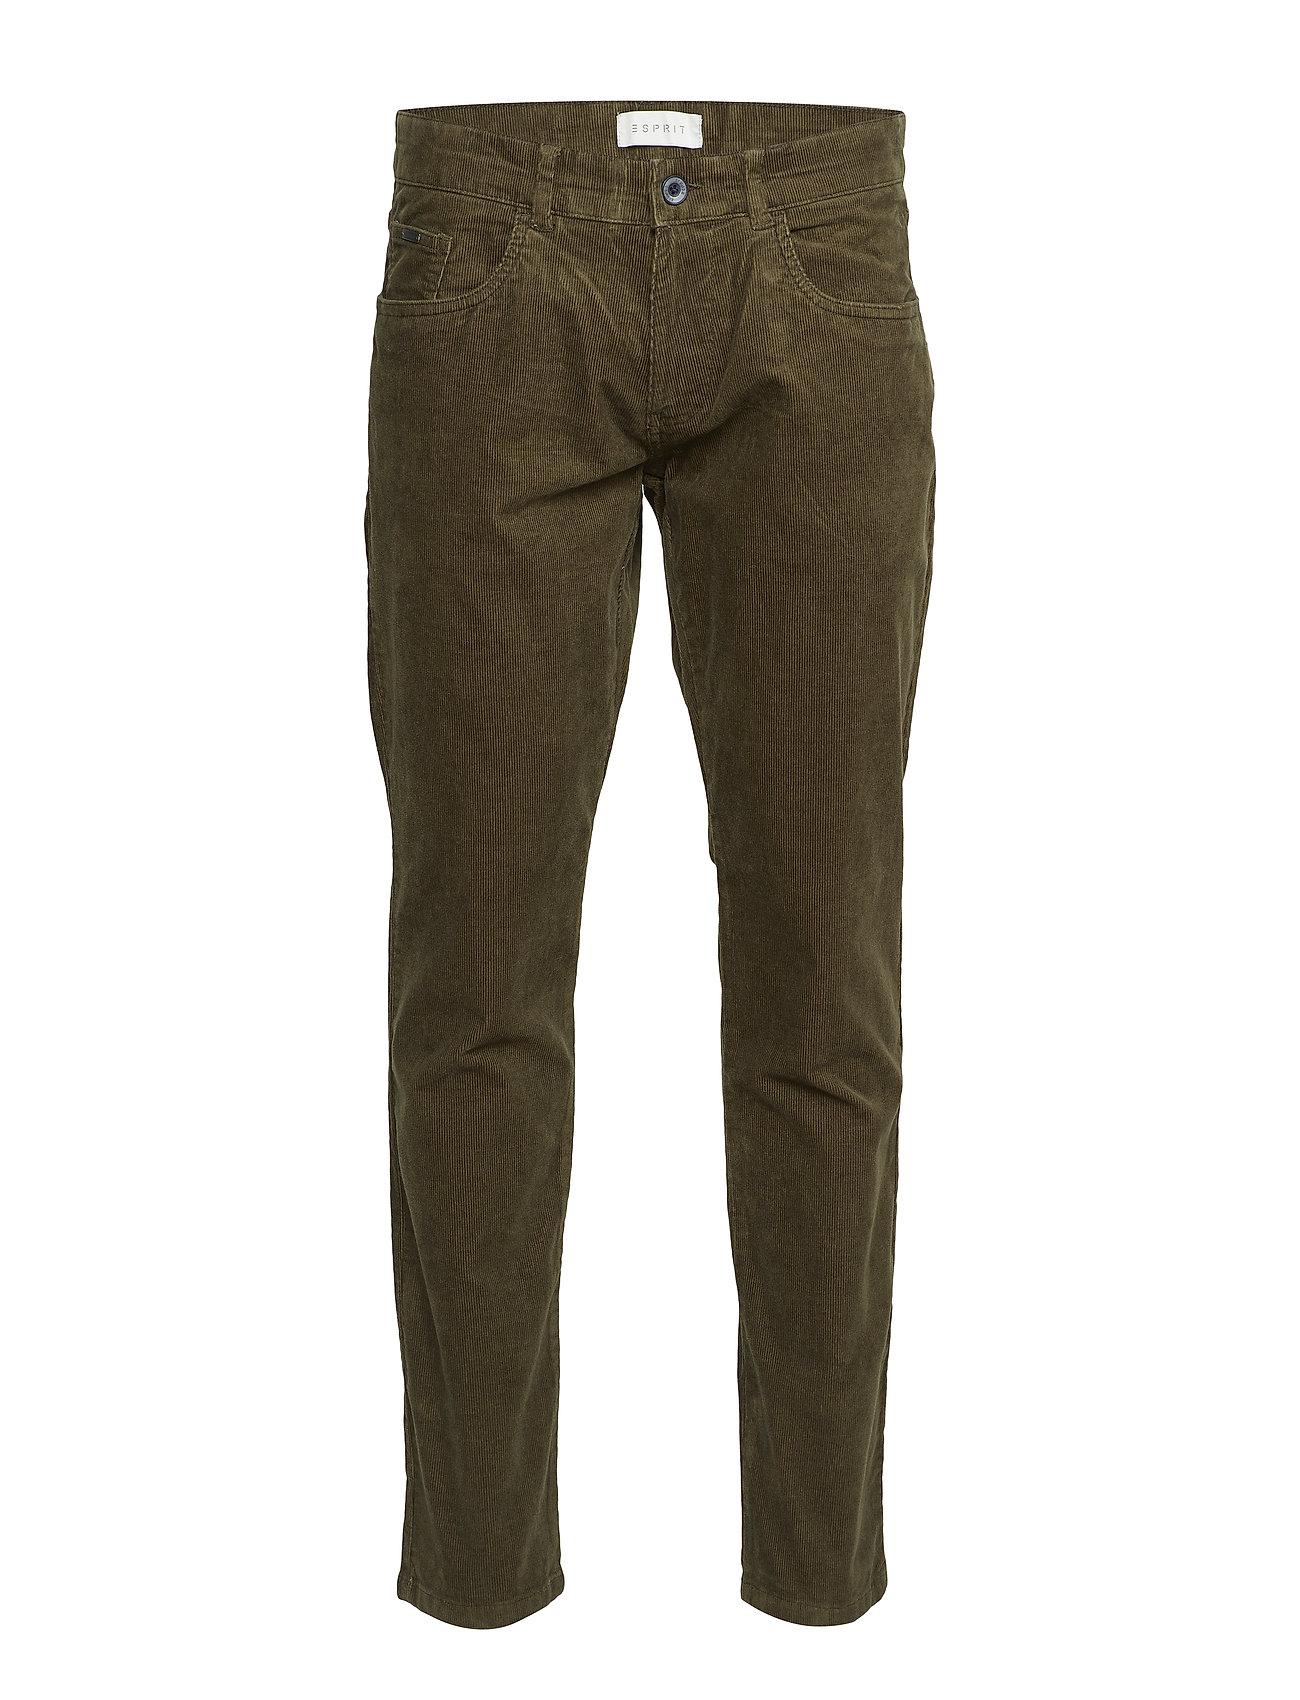 Esprit Casual Pants woven - OLIVE